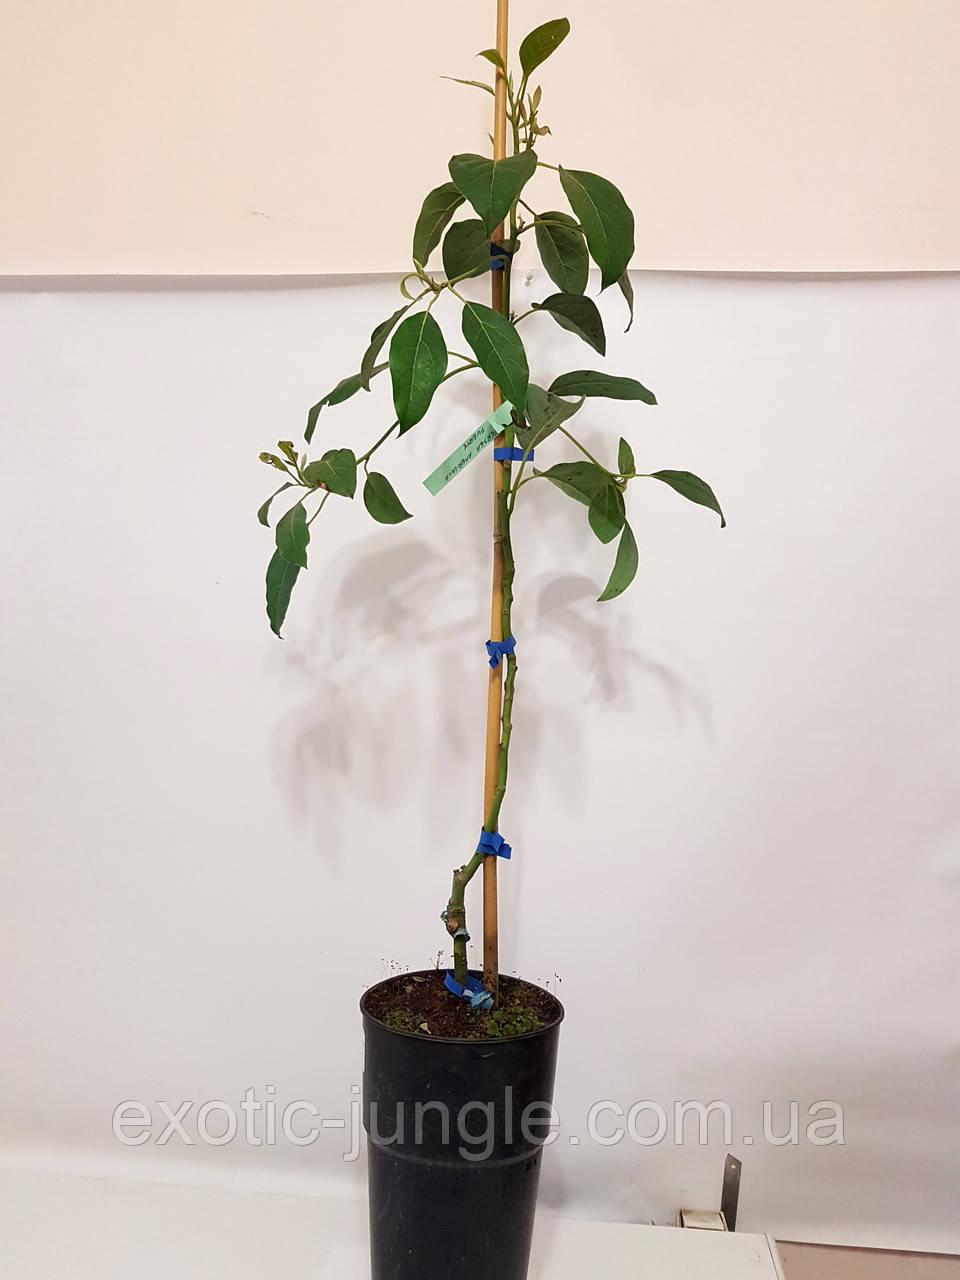 Авокадо (Persea americana) 30-40 см. Дичка. Комнатный